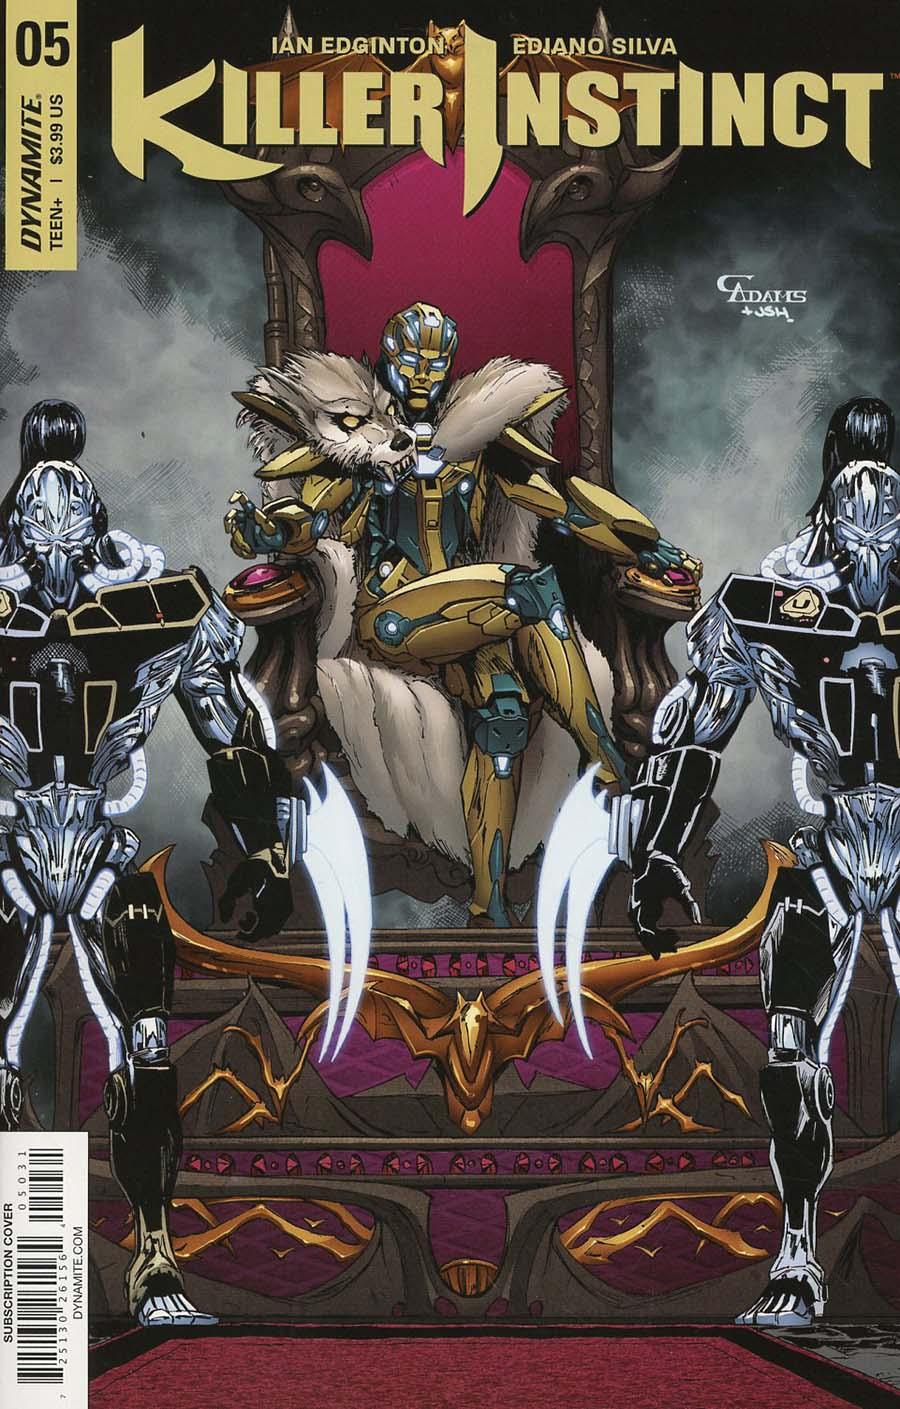 Killer Instinct Vol 2 #5 Cover C Variant Cam Adams Subscription Cover